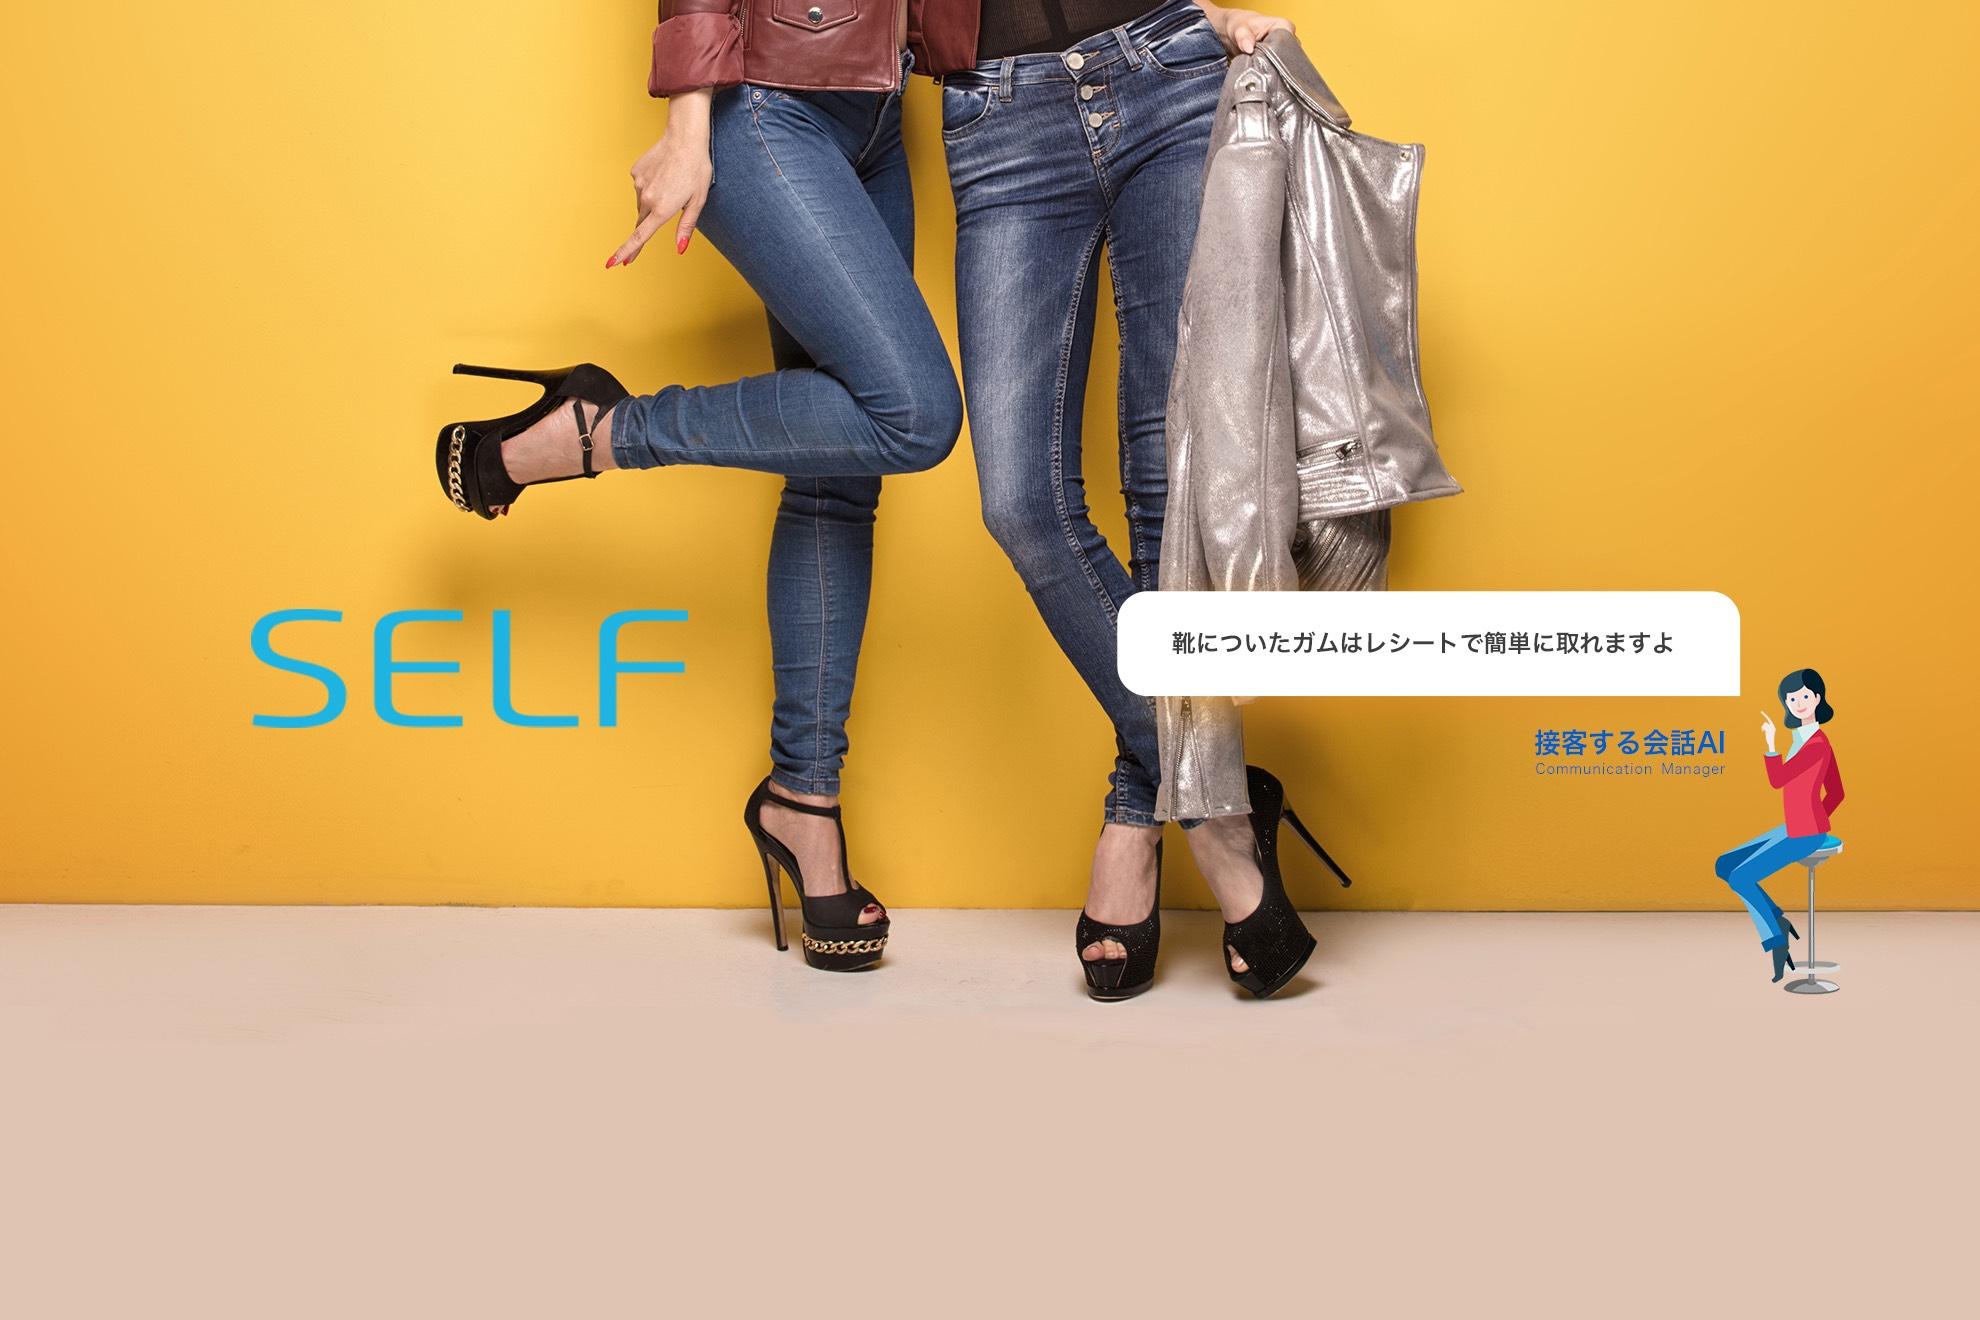 SELF株式会社